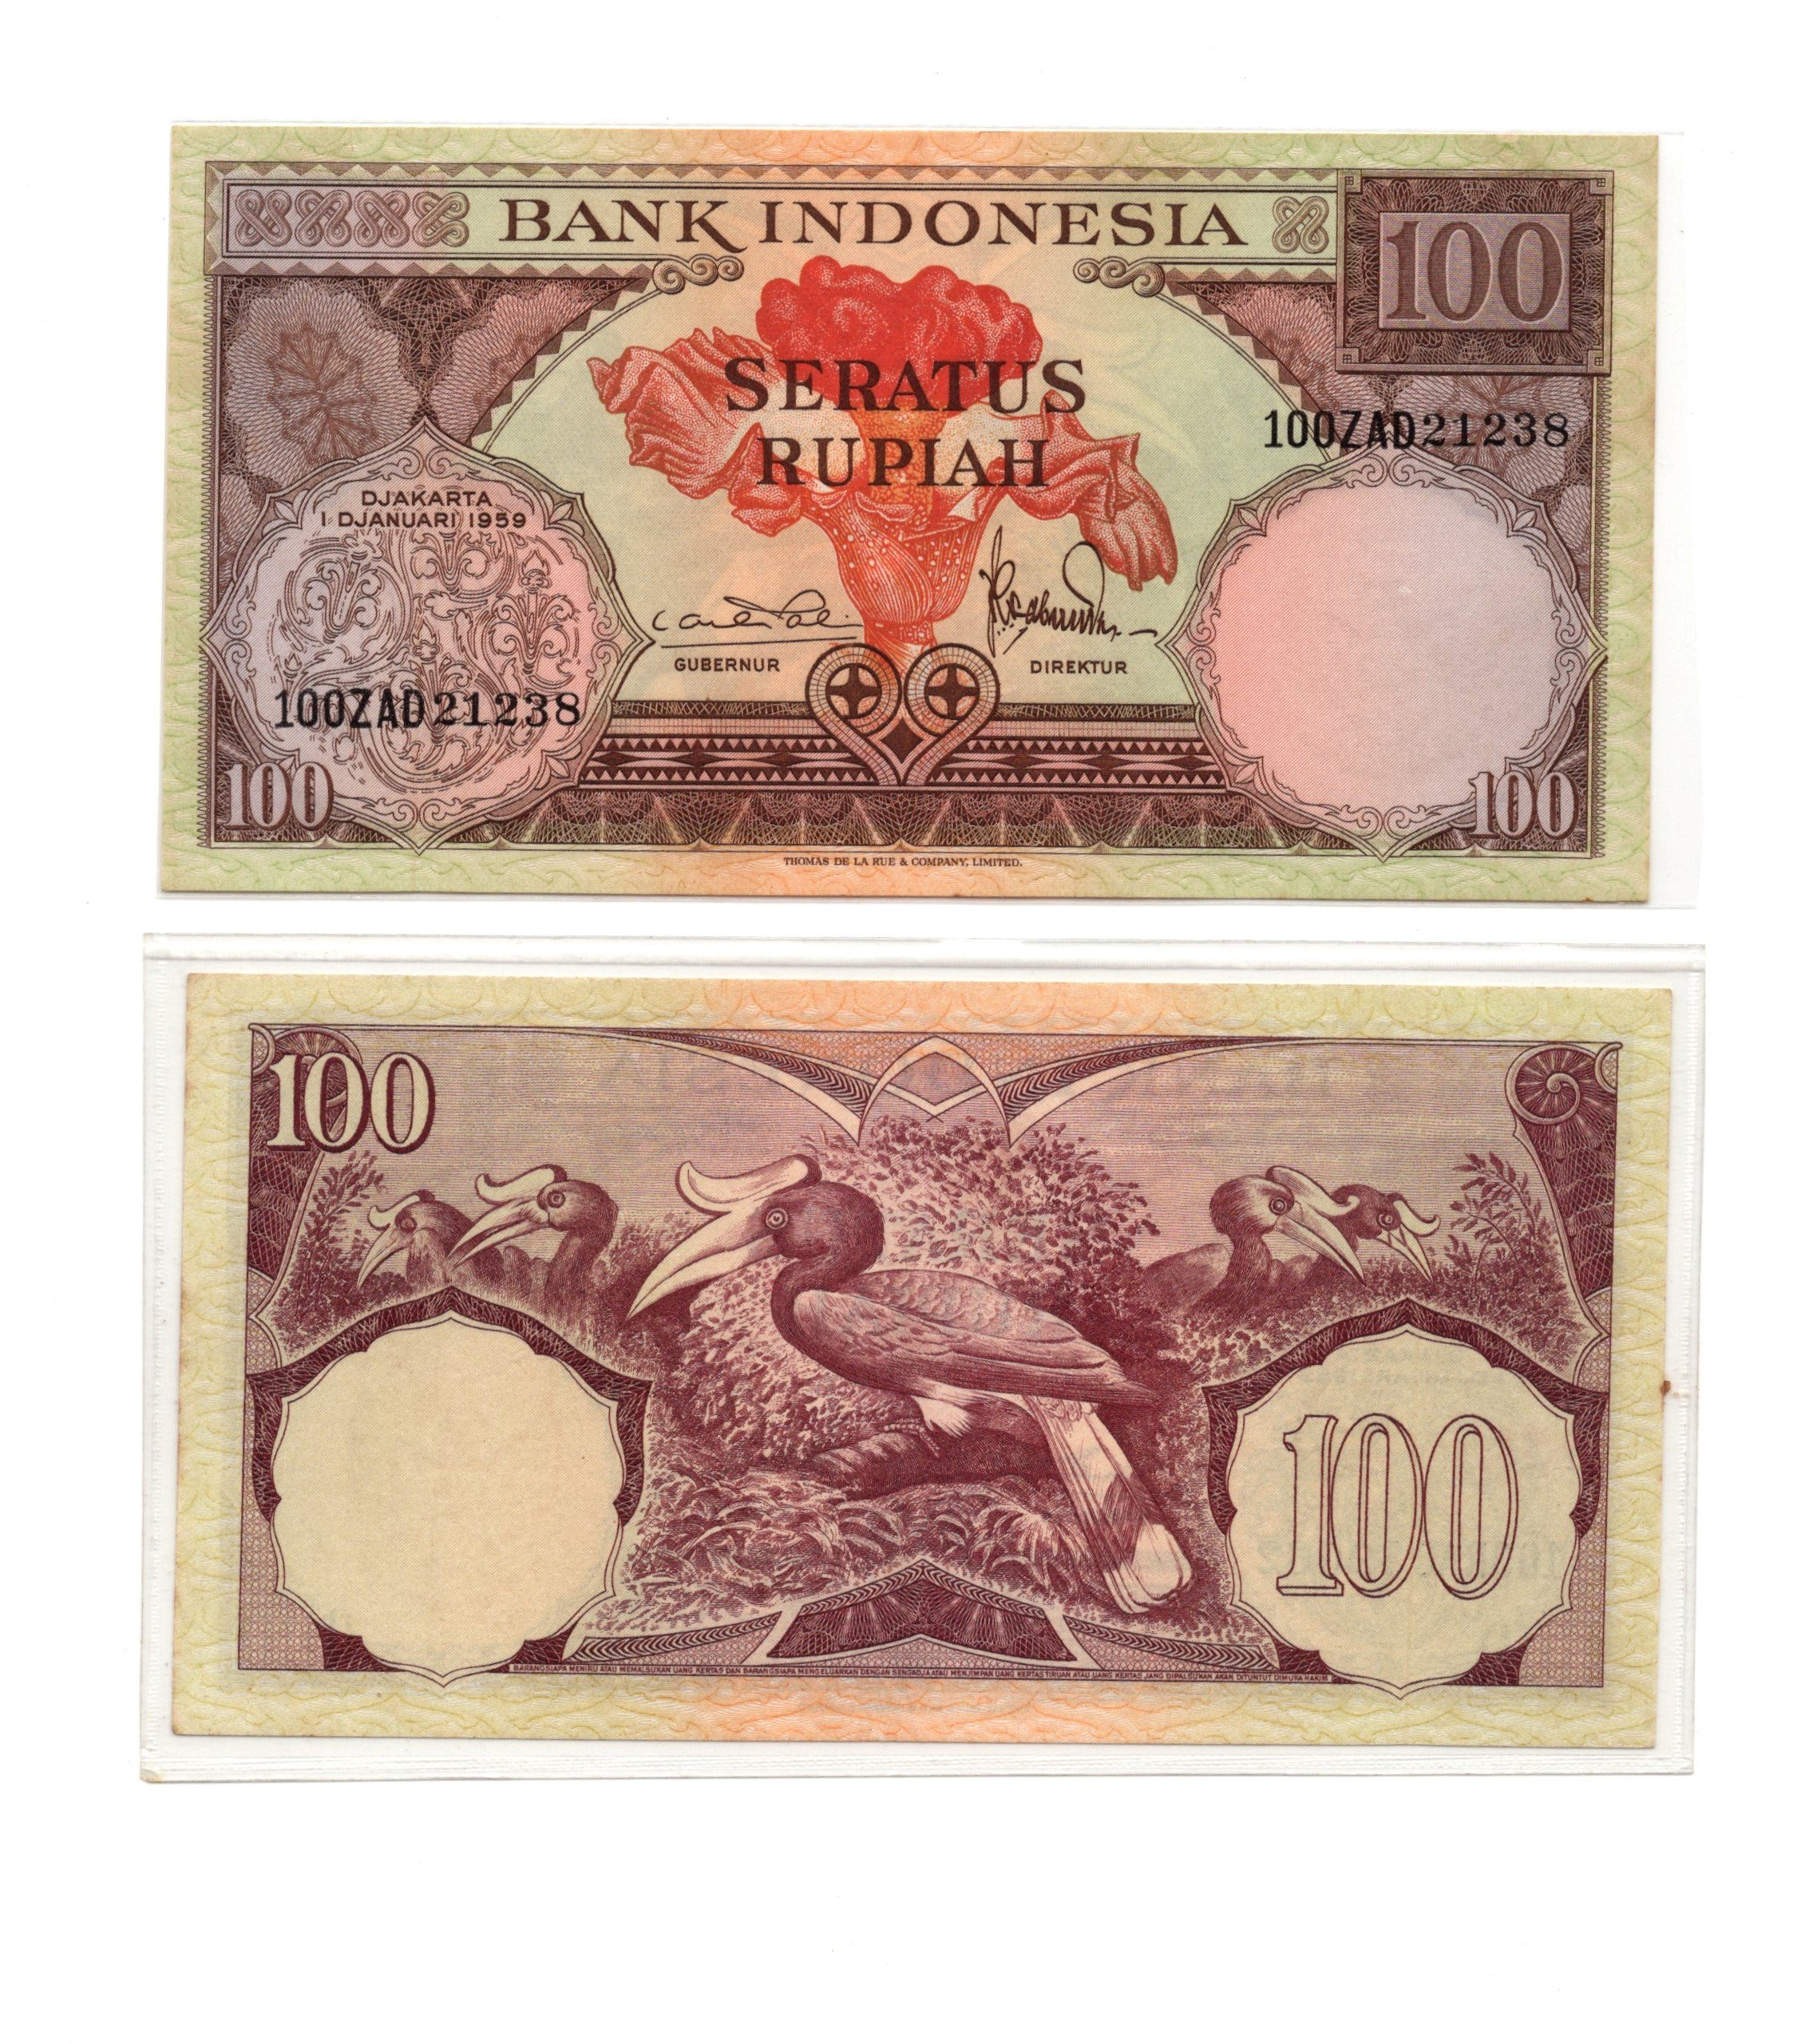 Indonesia 100 rupiah 1959